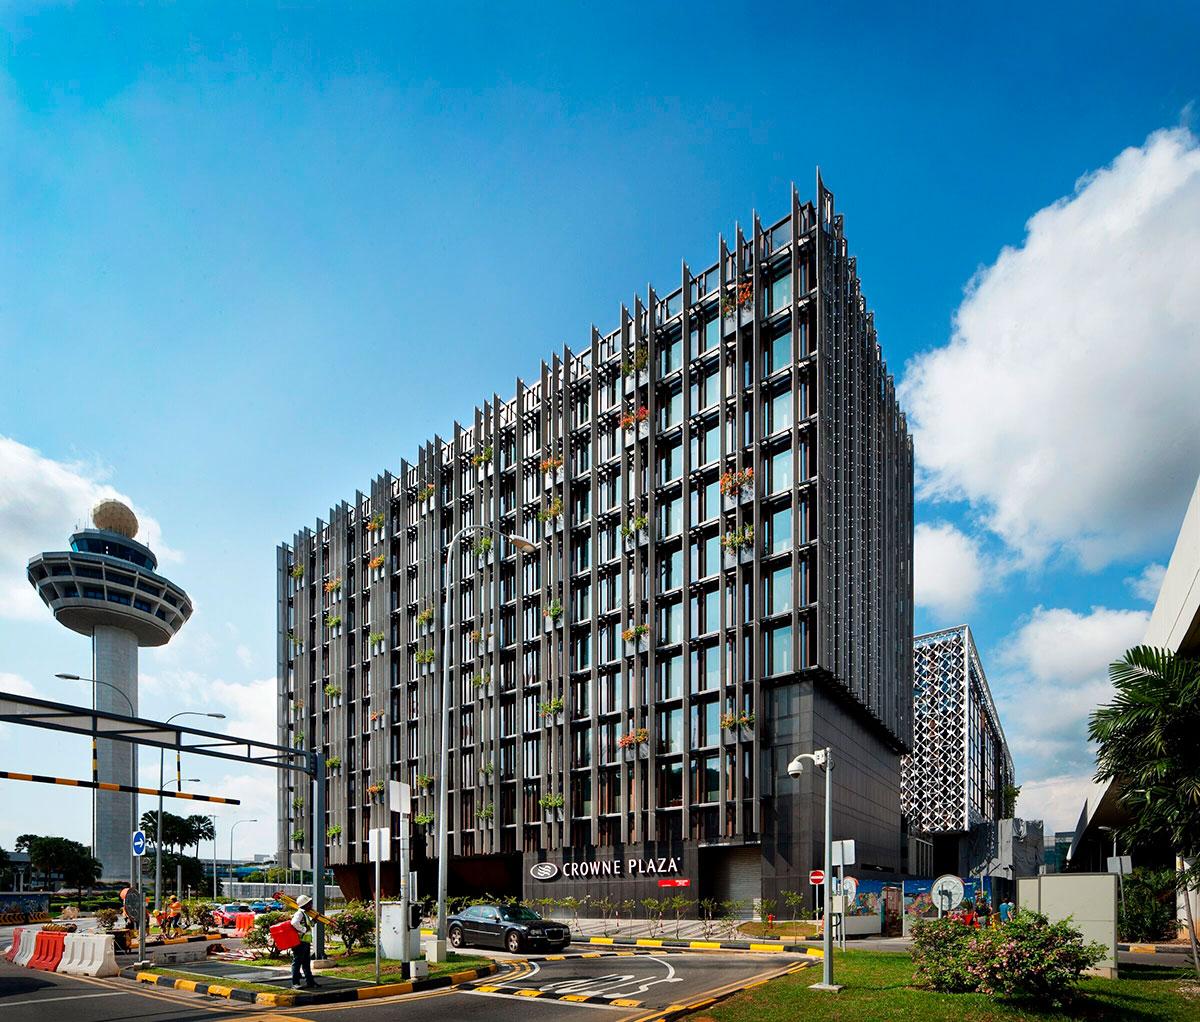 CROWNE-PLAZA-HOTEL-2